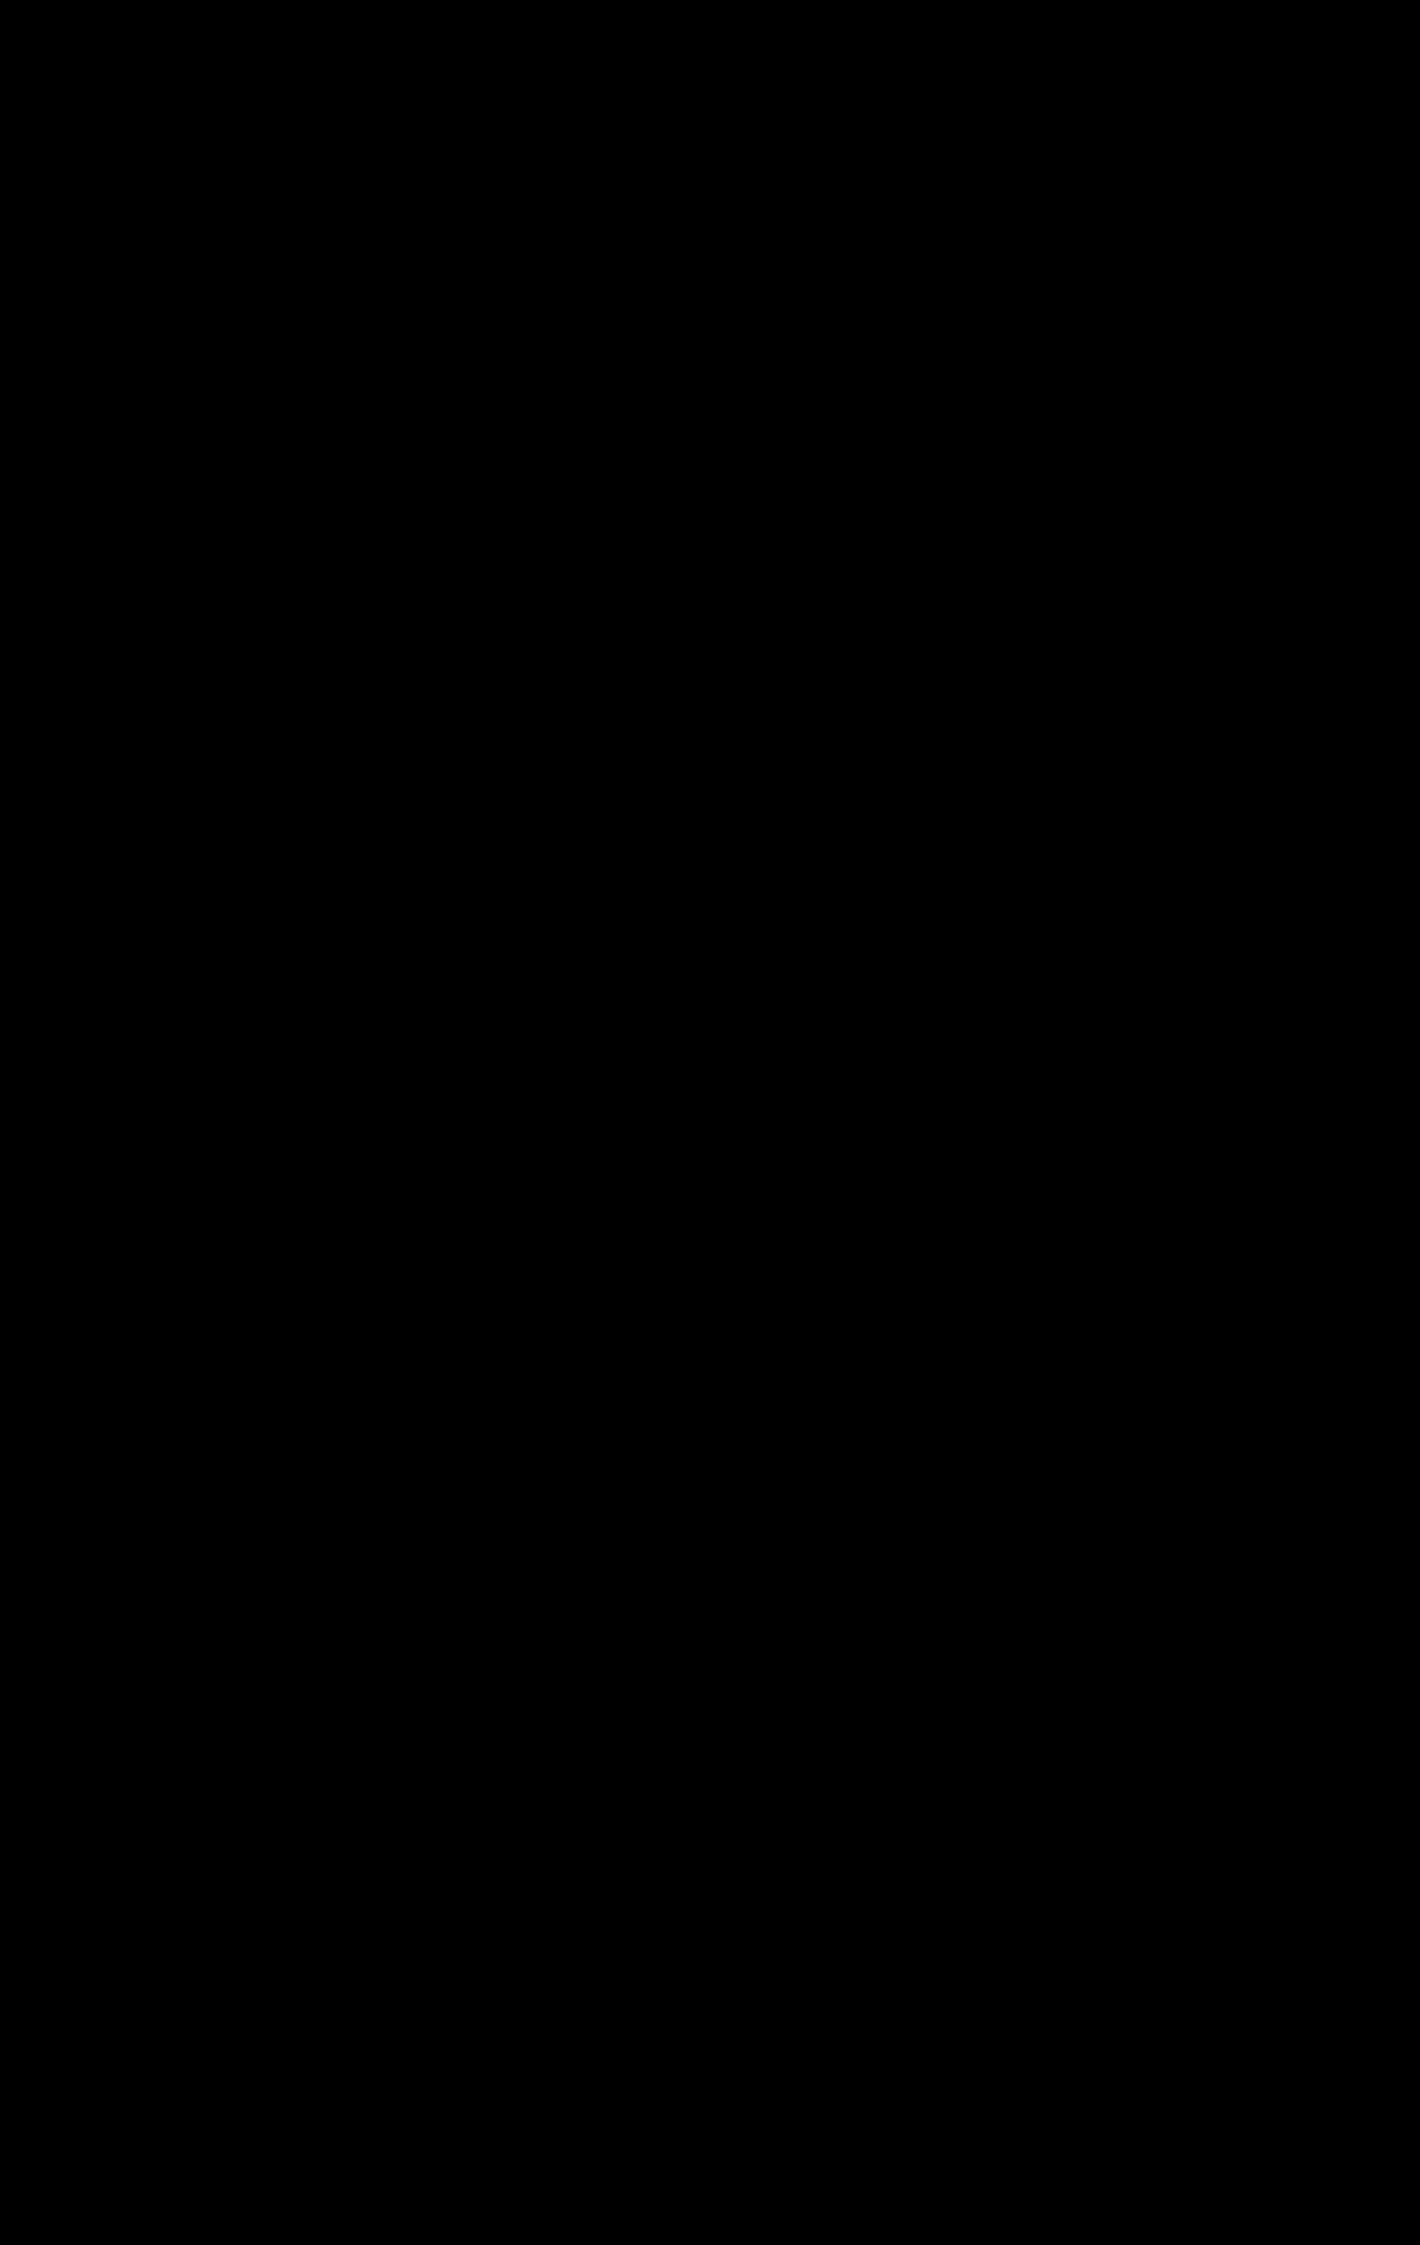 Pinna Morsicata